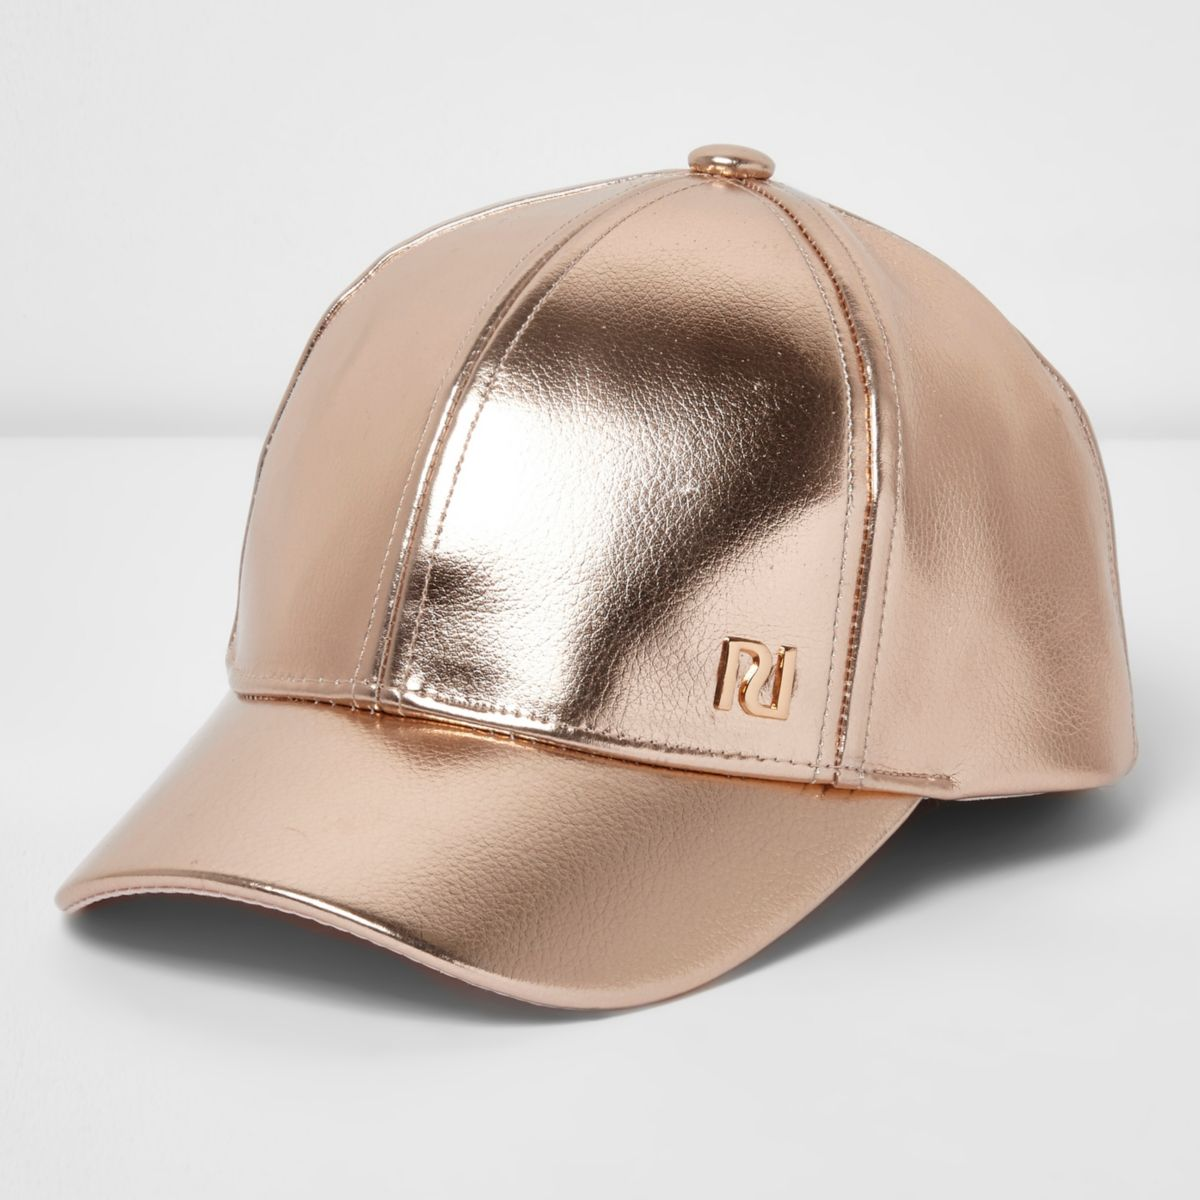 Pinke Kappe